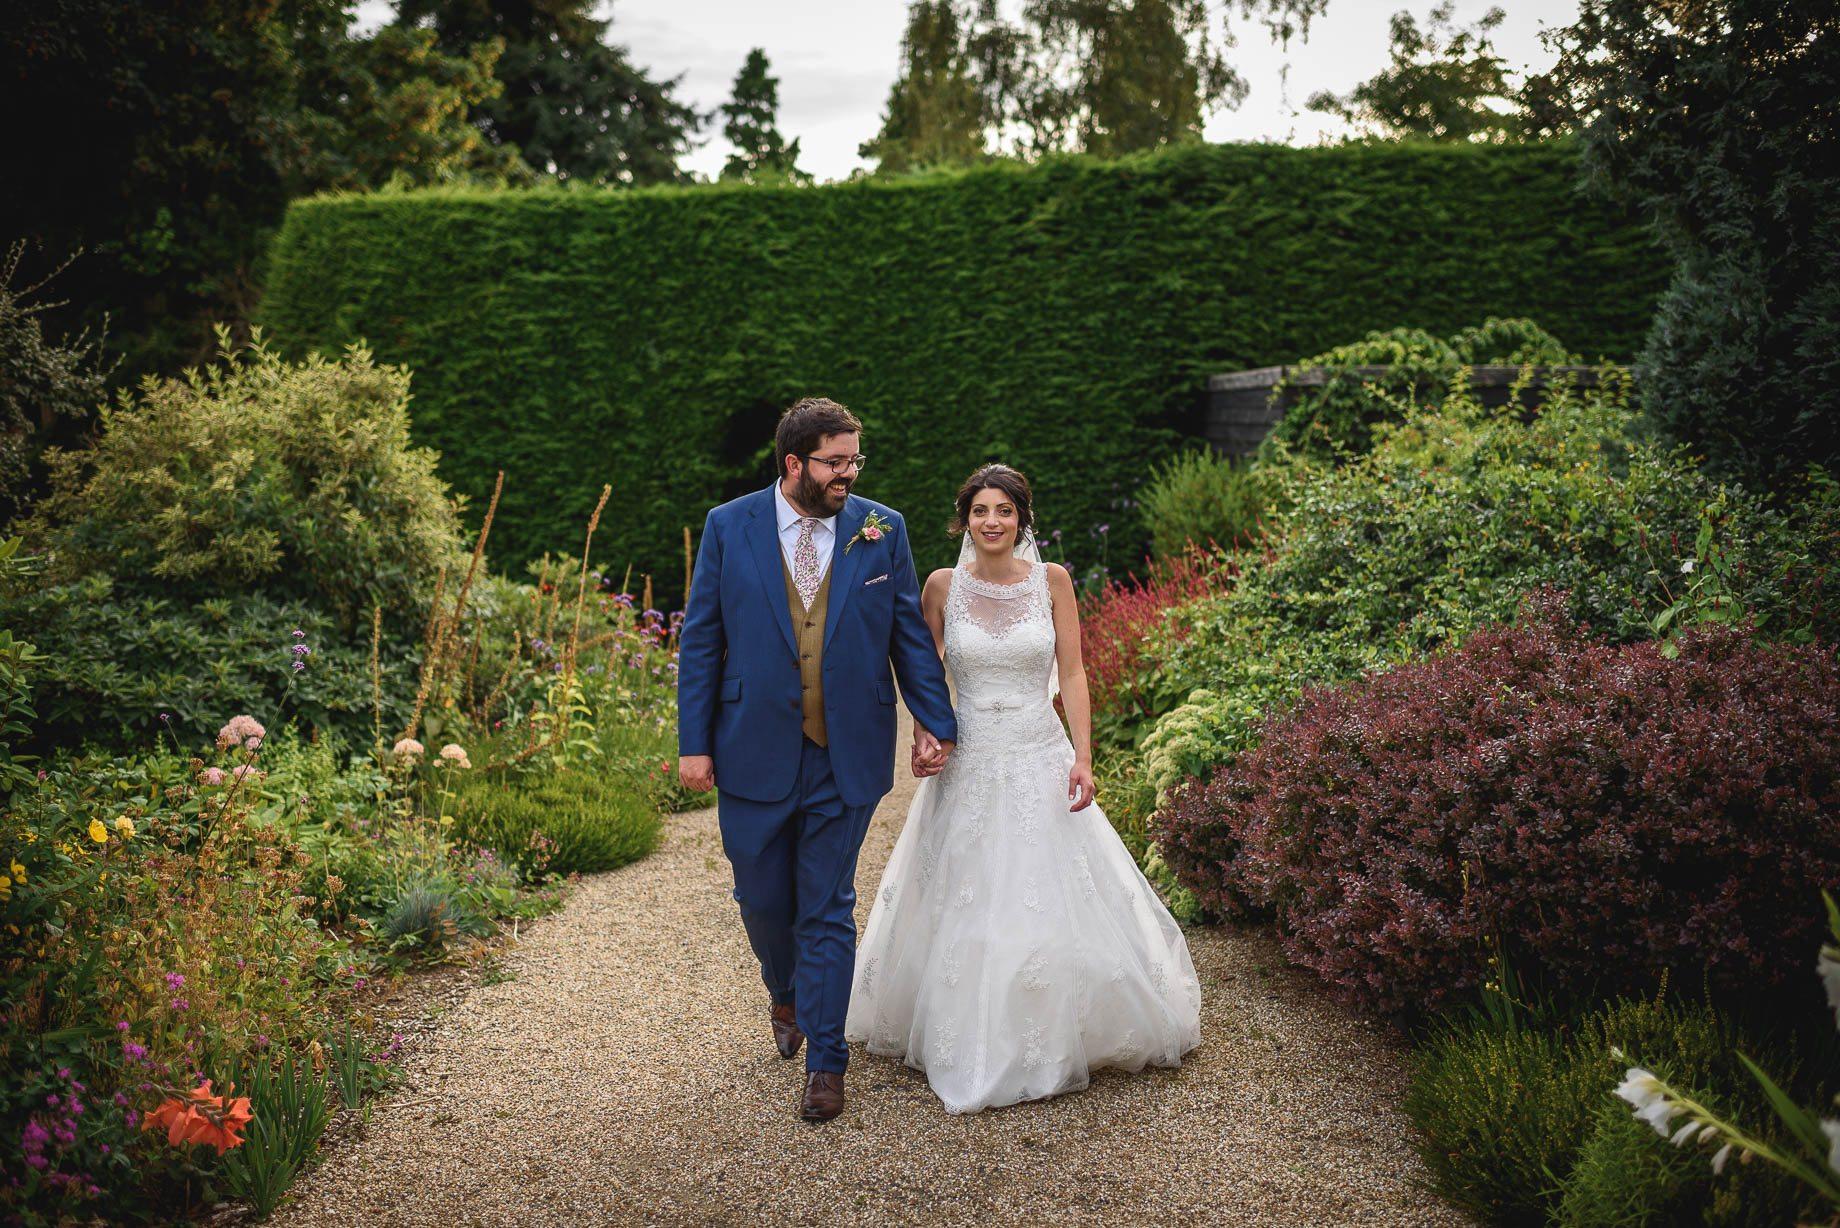 Gaynes Park wedding photography - Guy Collier Photography - Rachel and Jon (151 of 169)